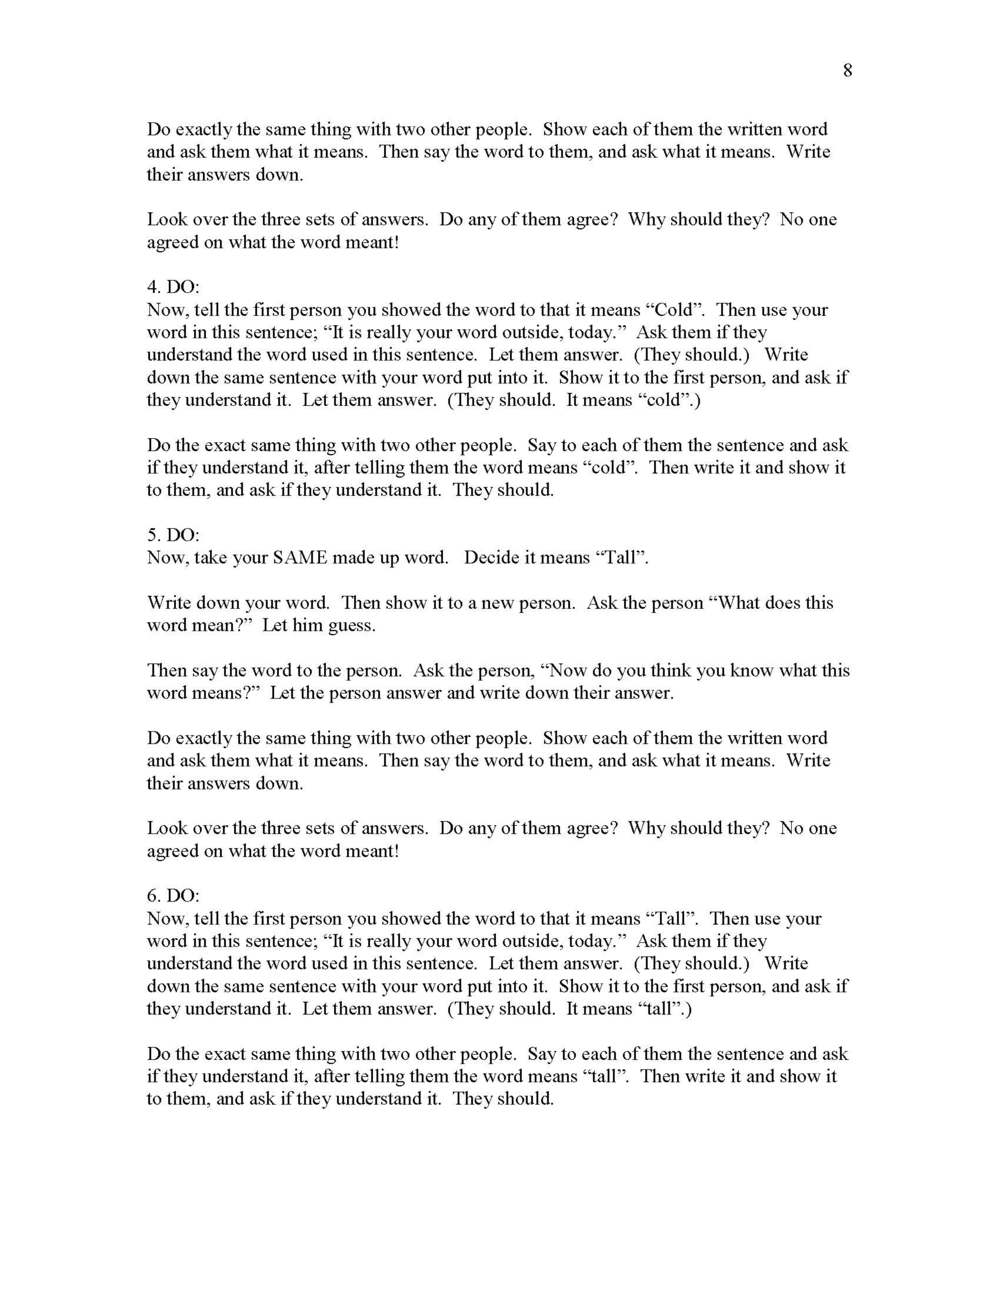 Samples Step 2 Creative Writing 1_Page_09.jpg